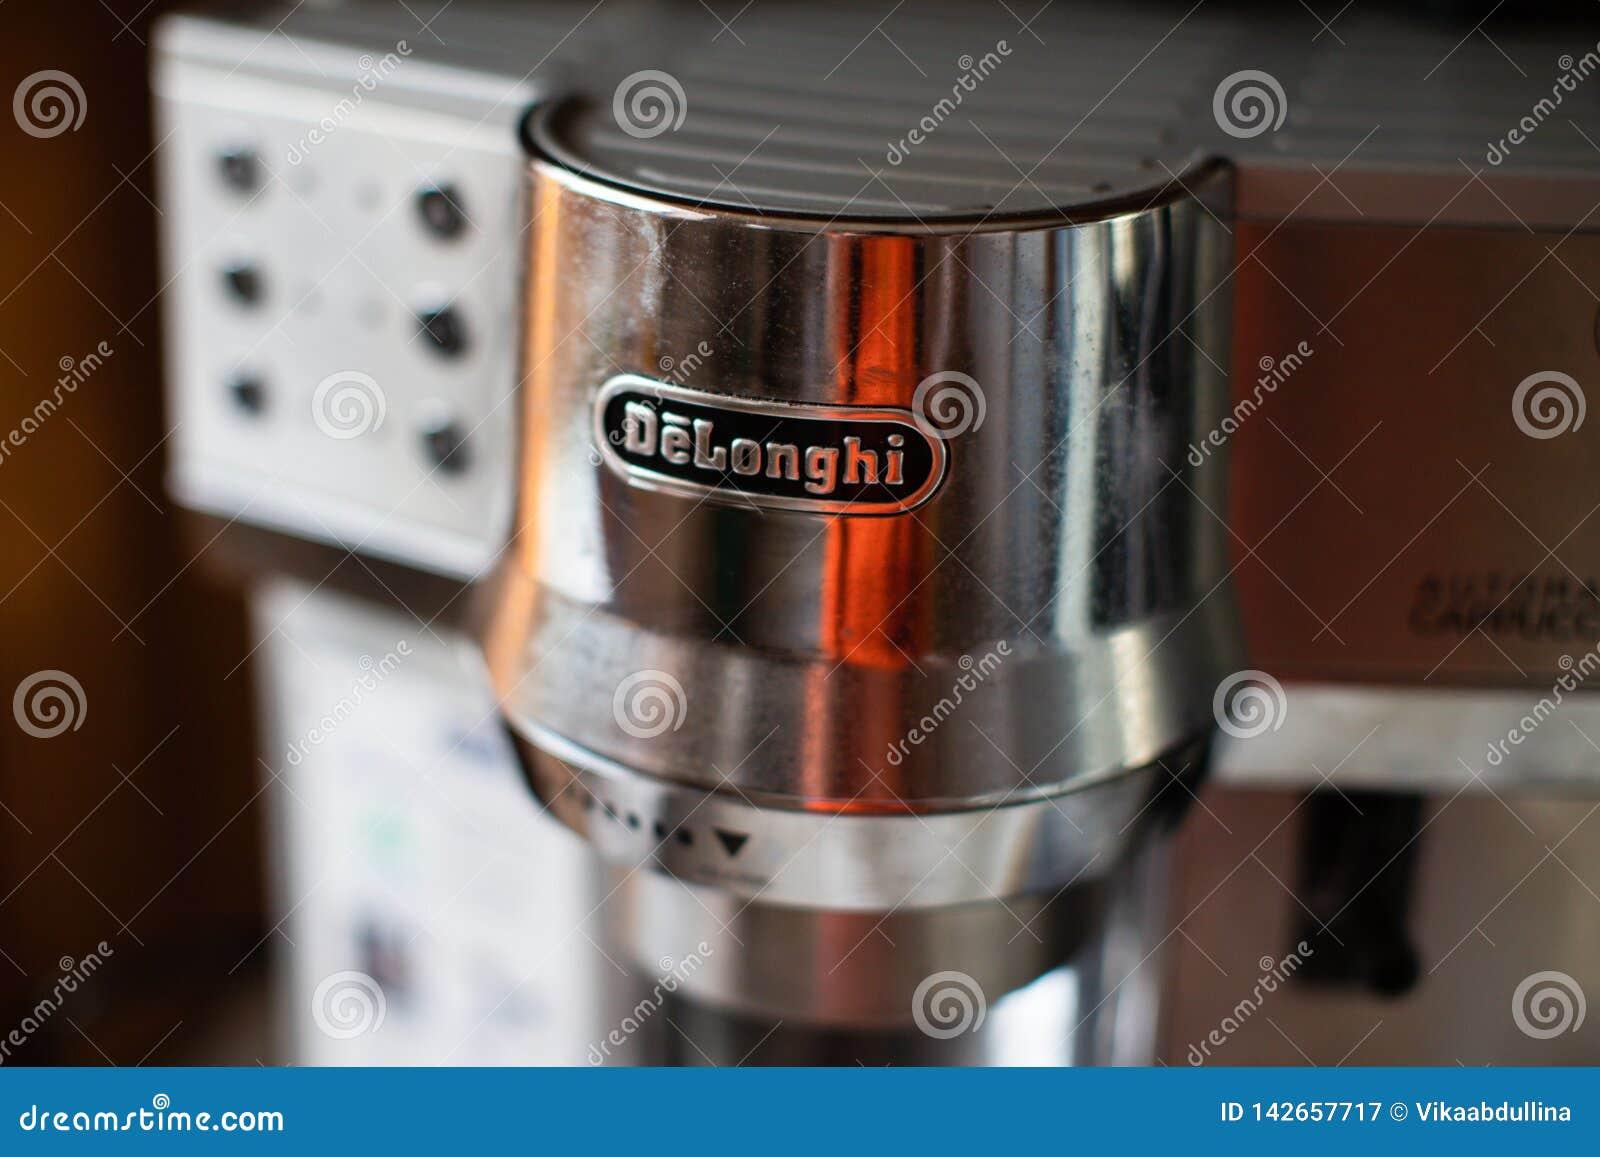 Machine de café de cappuccino avec le logo de Delonghi